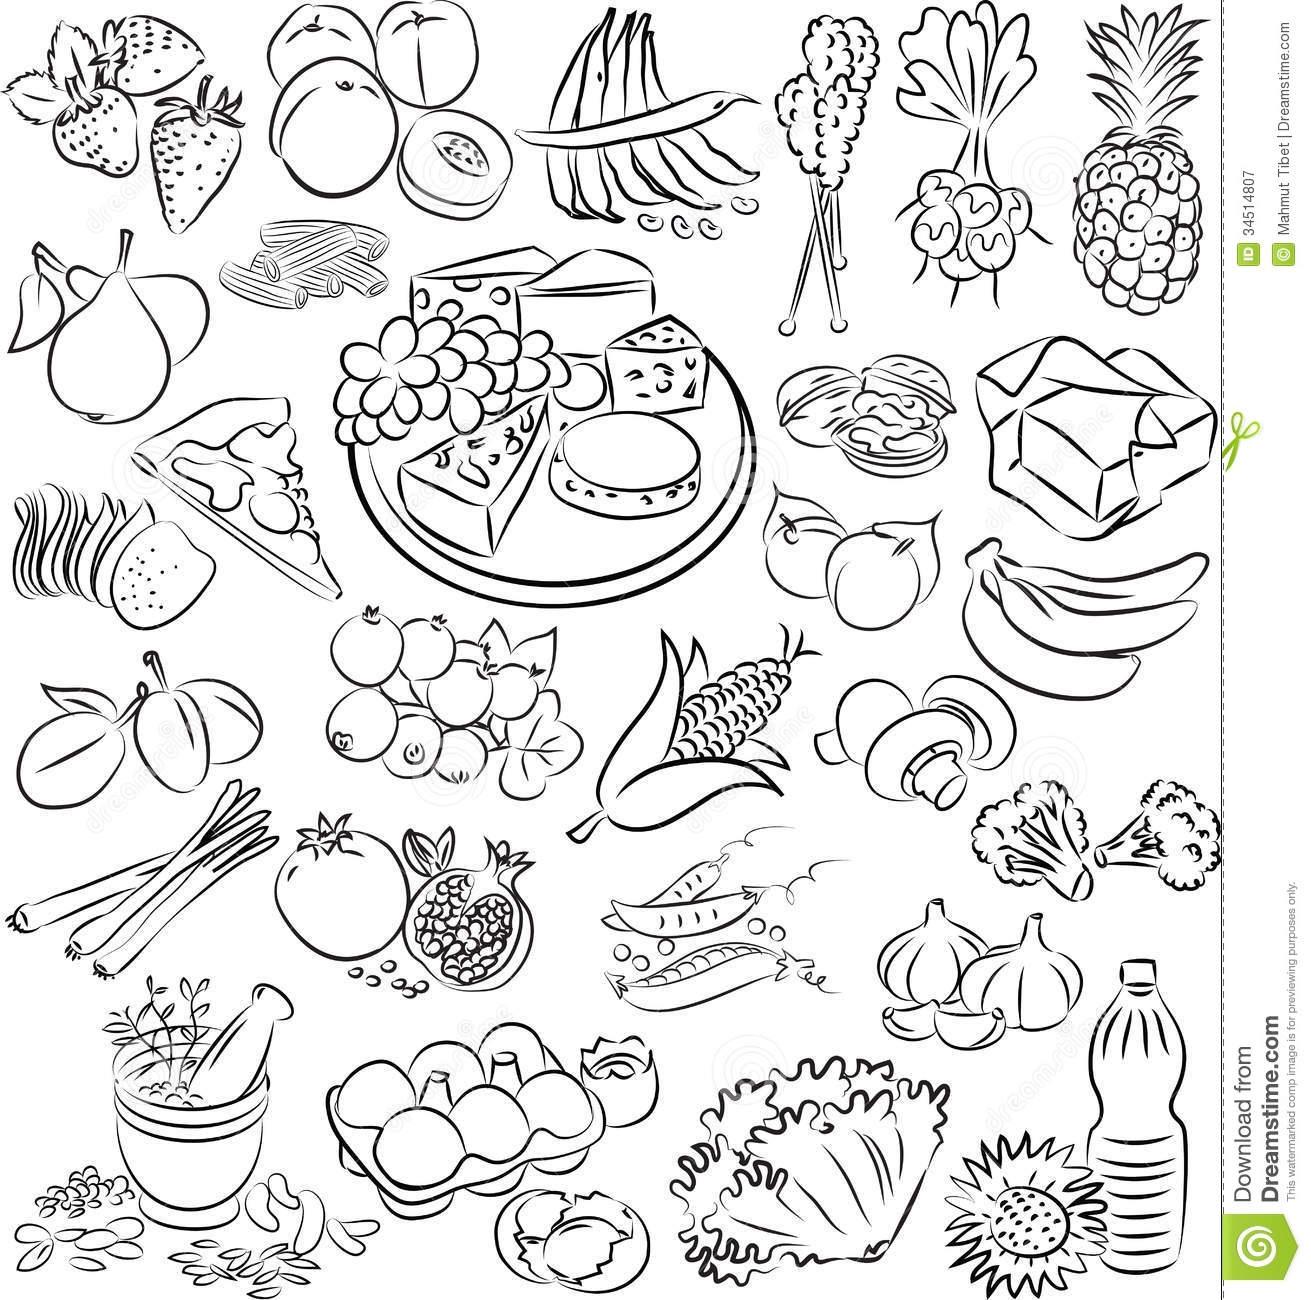 Food clipart jpg format clip art free stock Food clipart black and white jpg format - ClipartFest clip art free stock